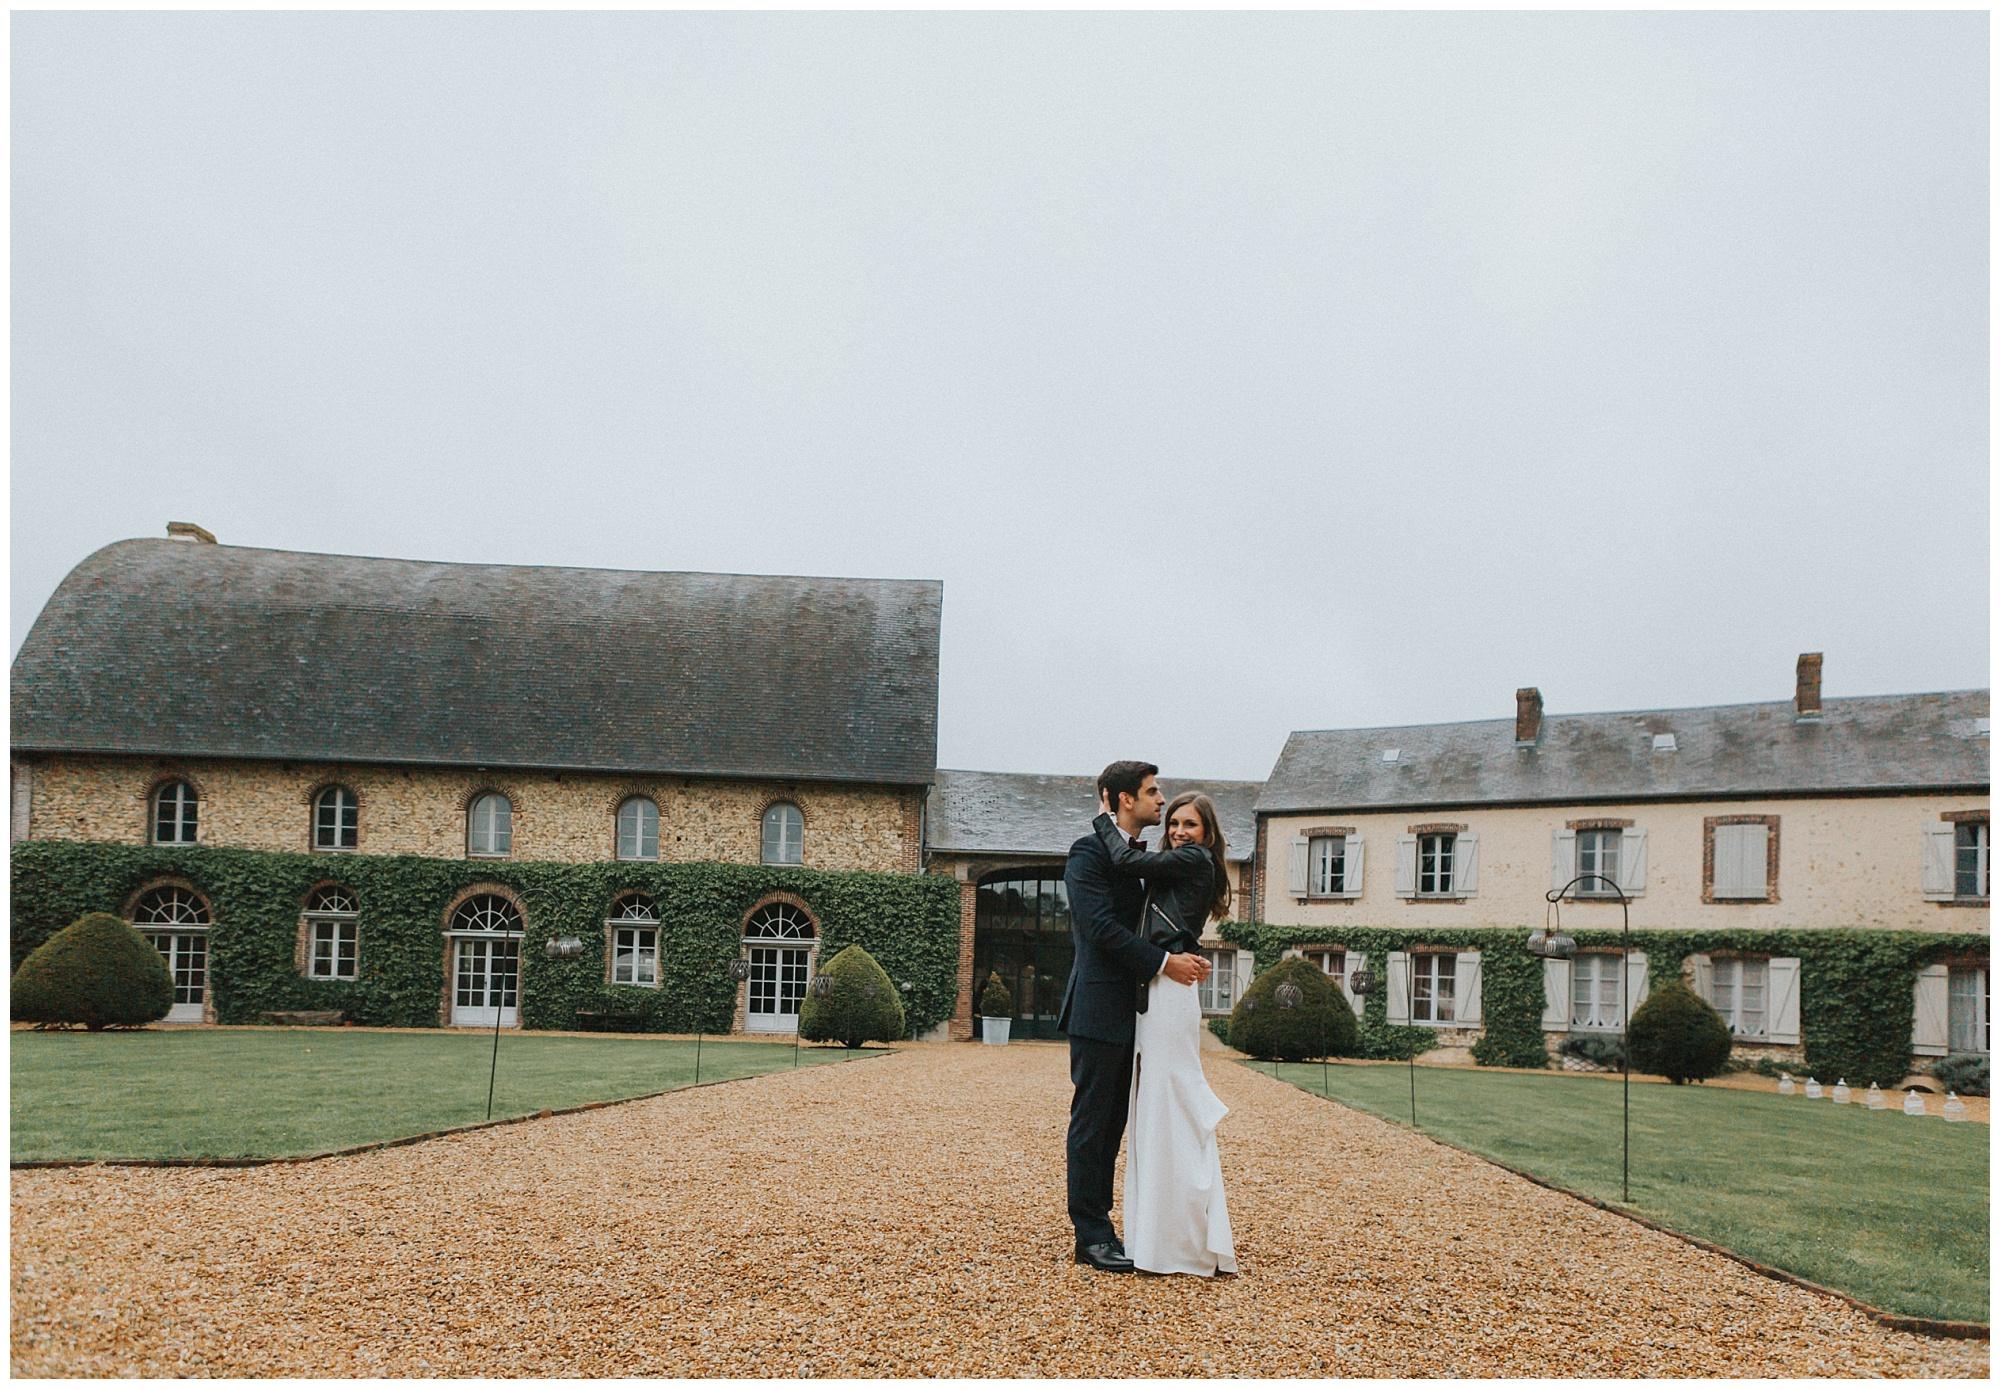 Kateryna-photos-photographer-reims-domaine-des-evis-mariage-normandie-rime-arodaky_0270.jpg